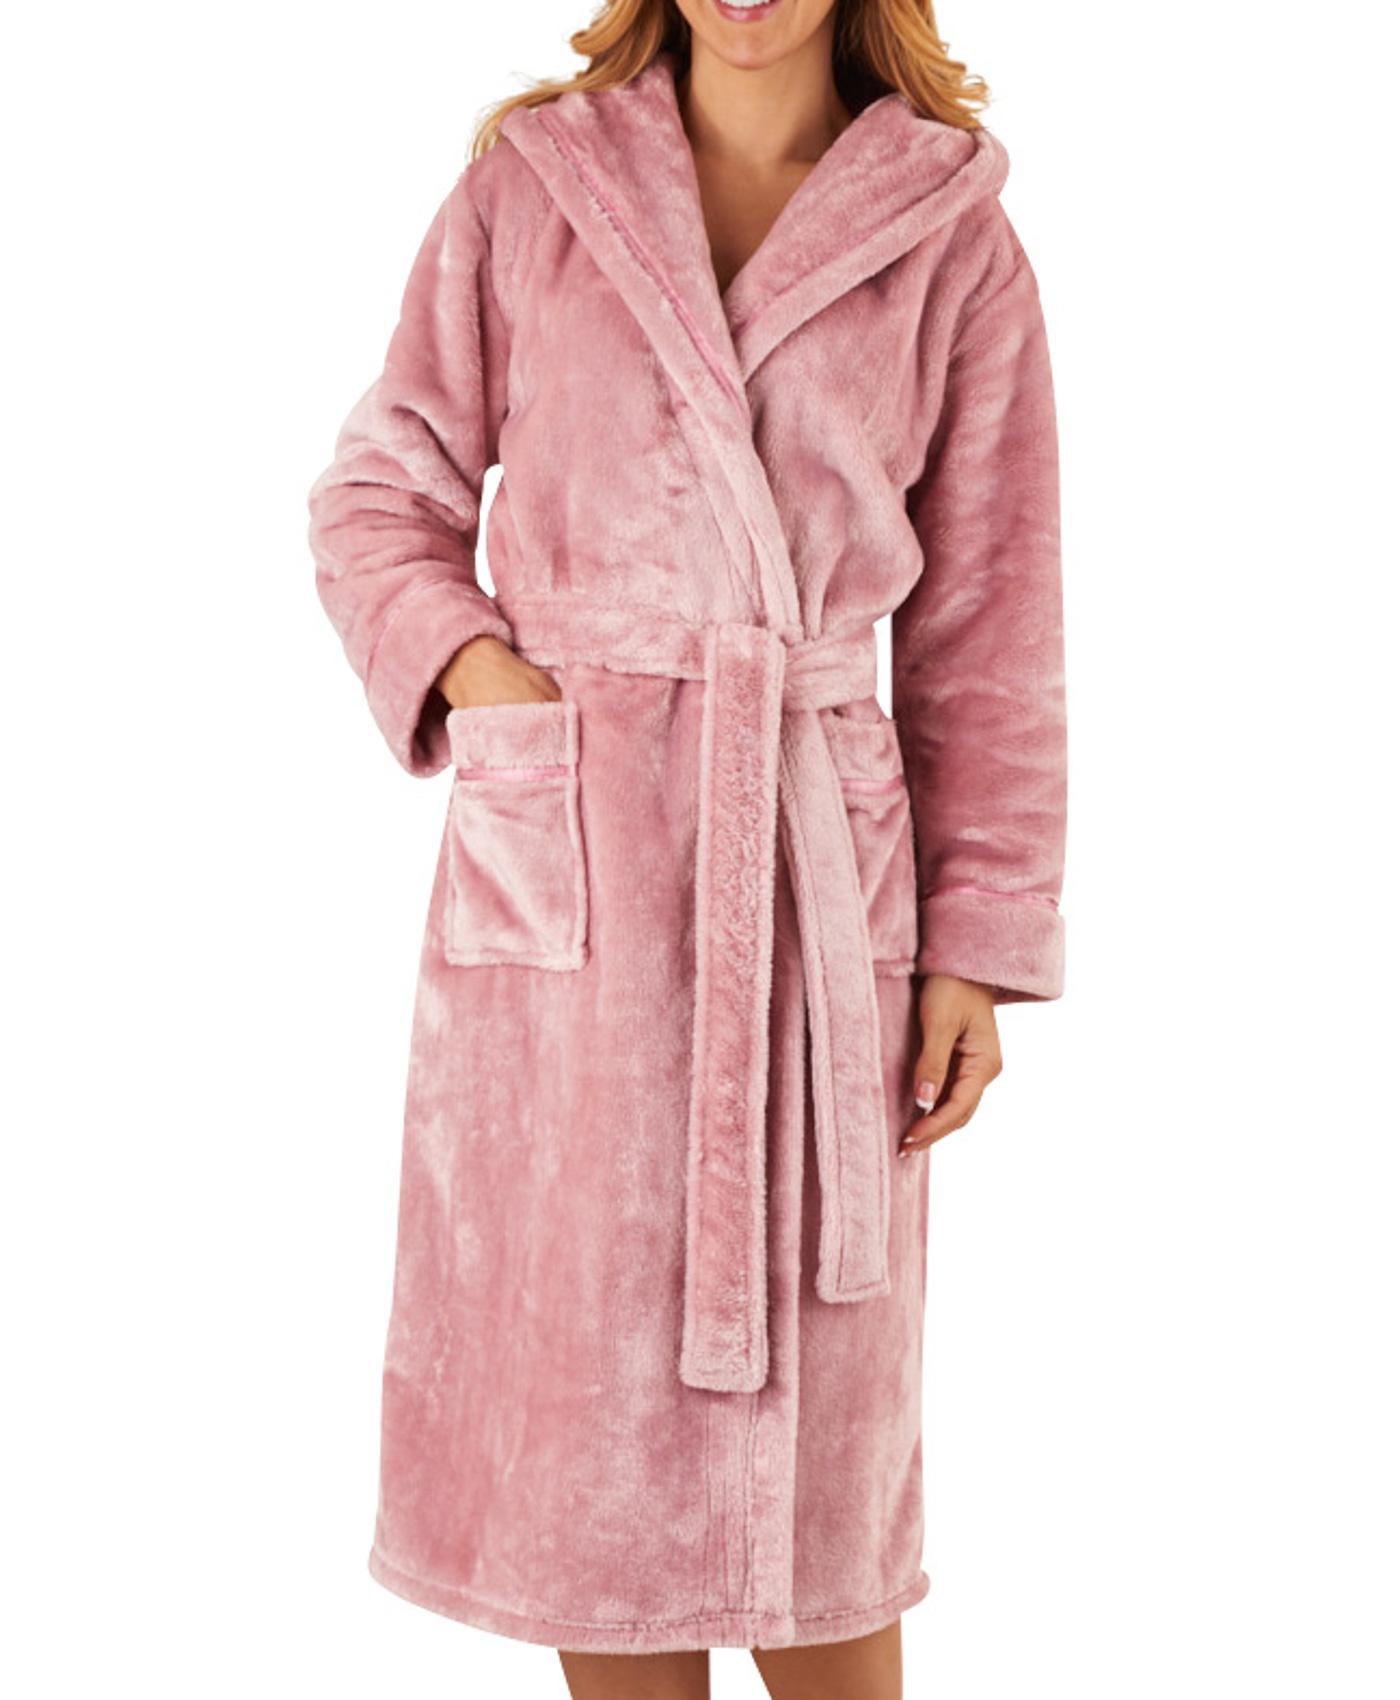 619c95ecad2 Slenderella Womens Luxury Thick Flannel Fleece Dressing Gown Hooded ...